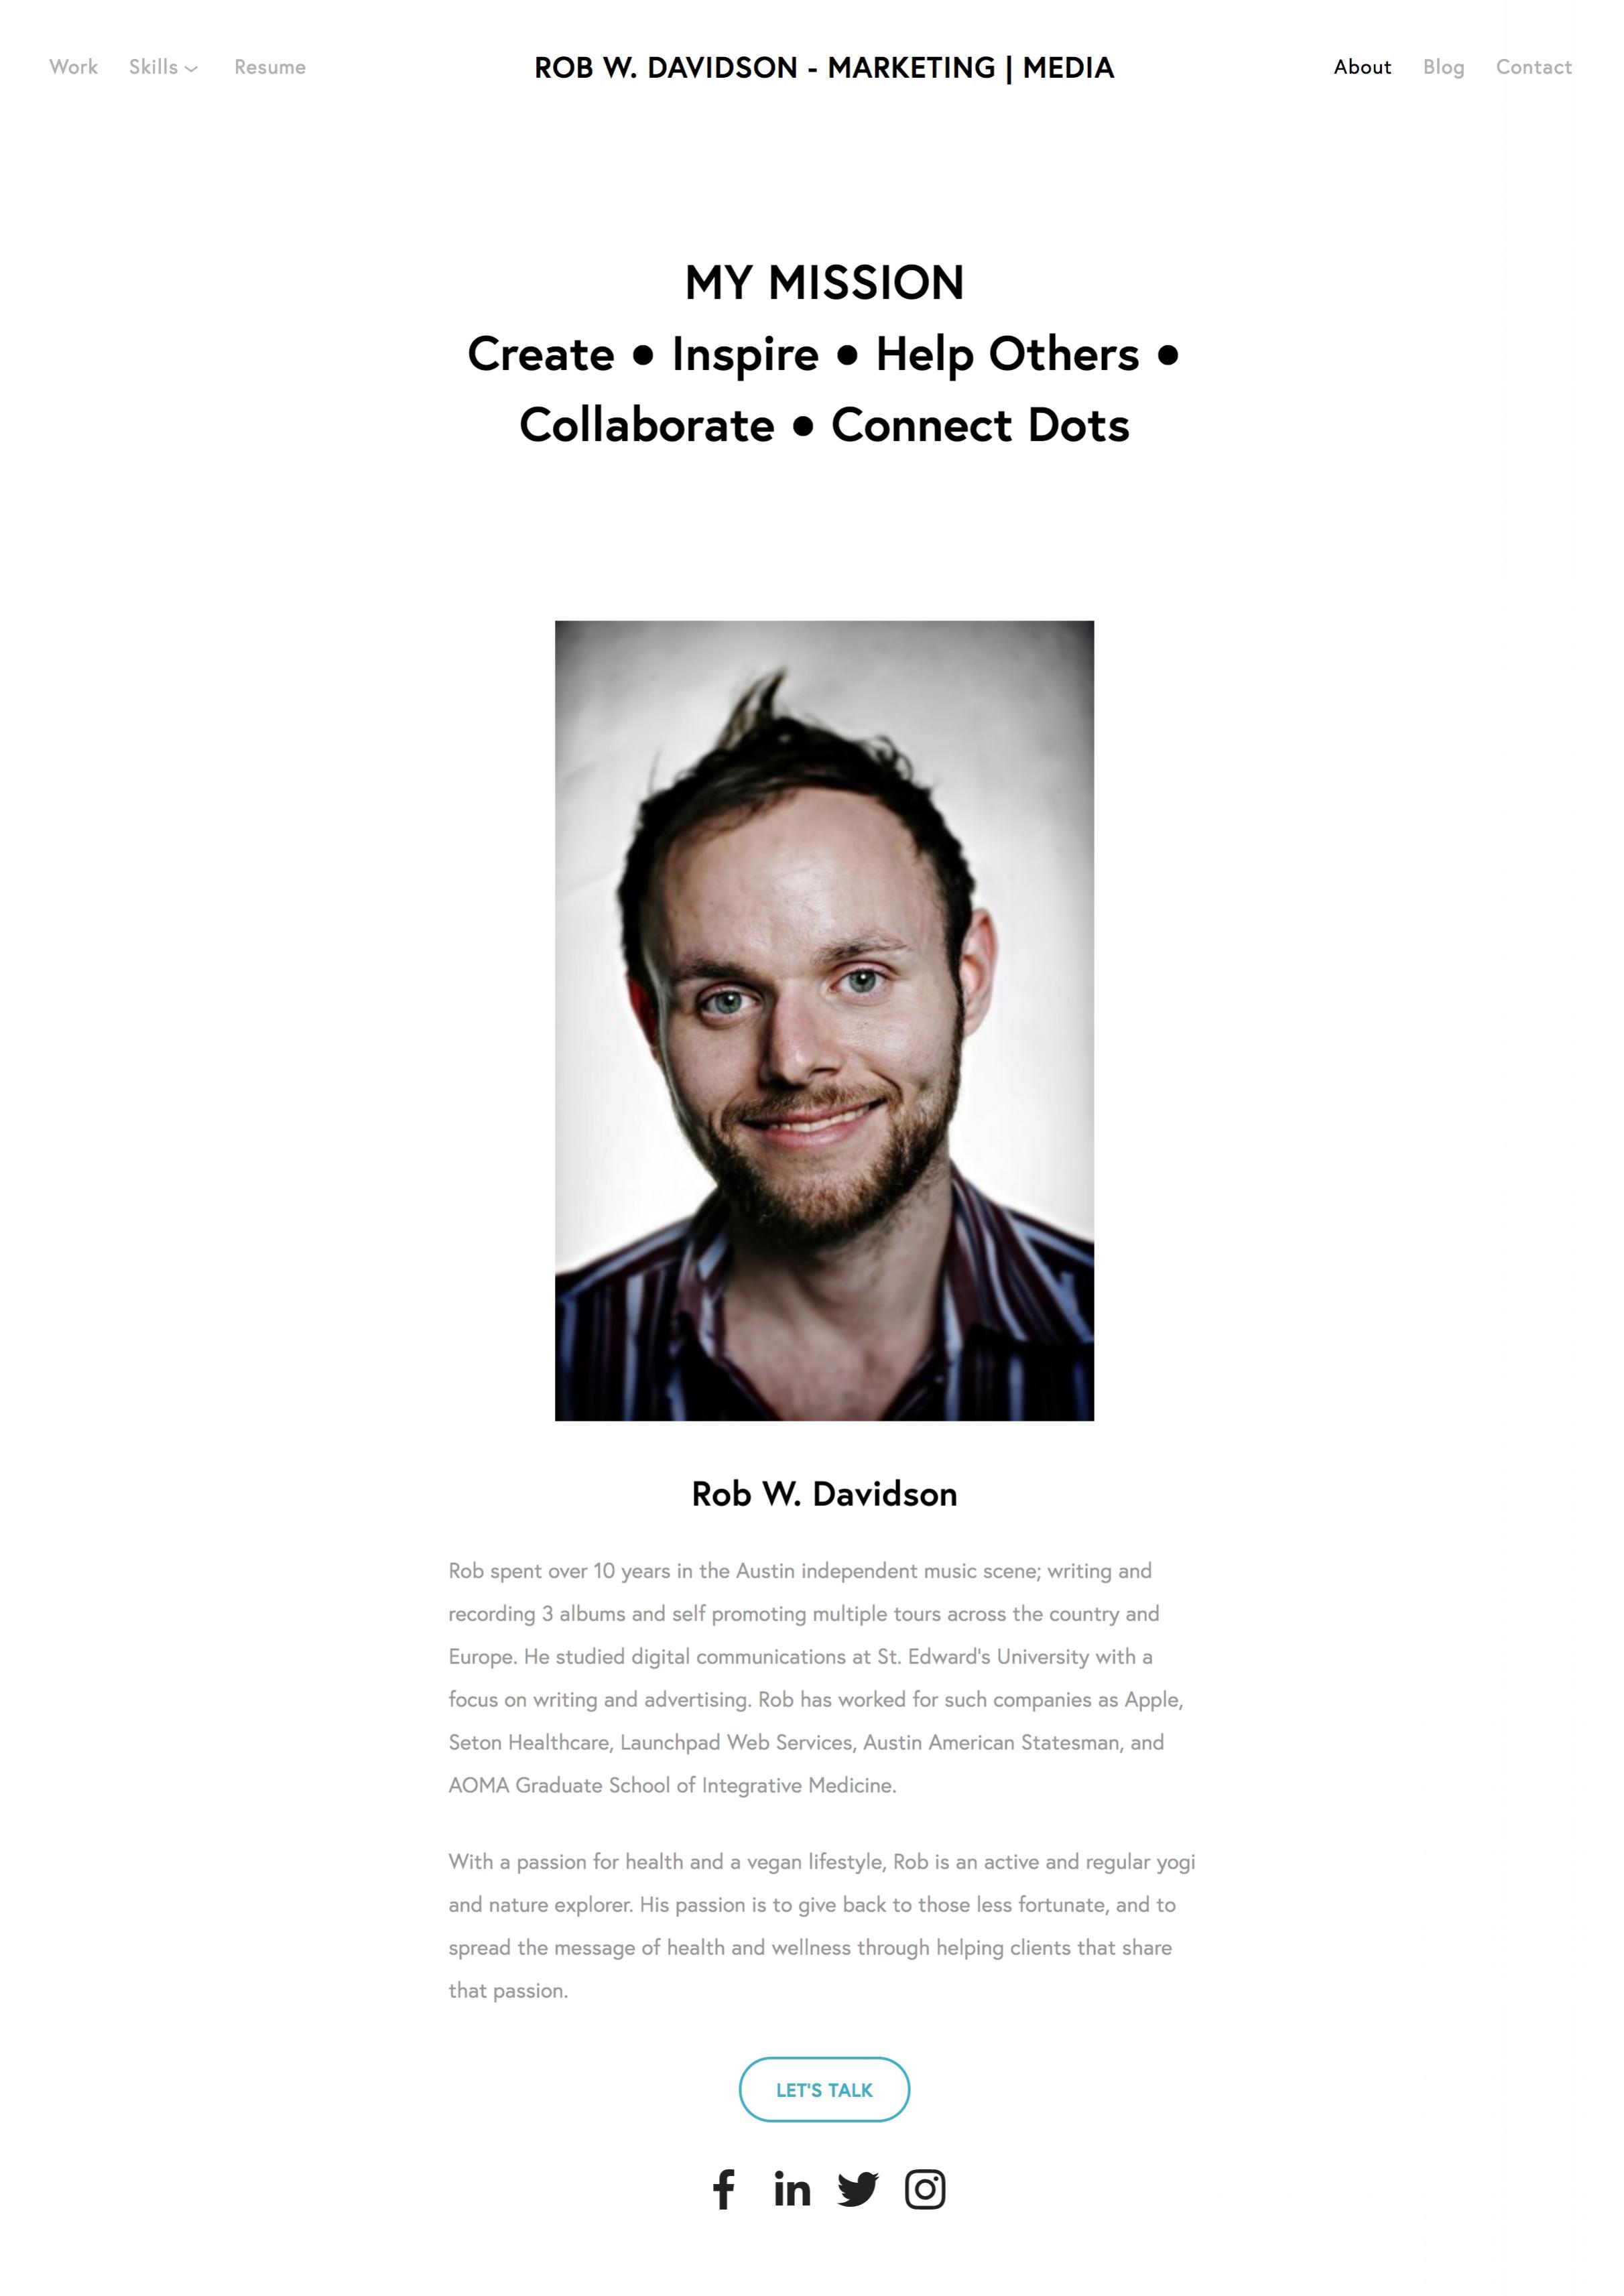 About Rob W  Davidson   Digital Marketing Leader   Austin  TX — Rob W  Davidson   Marketing   Media 2.png